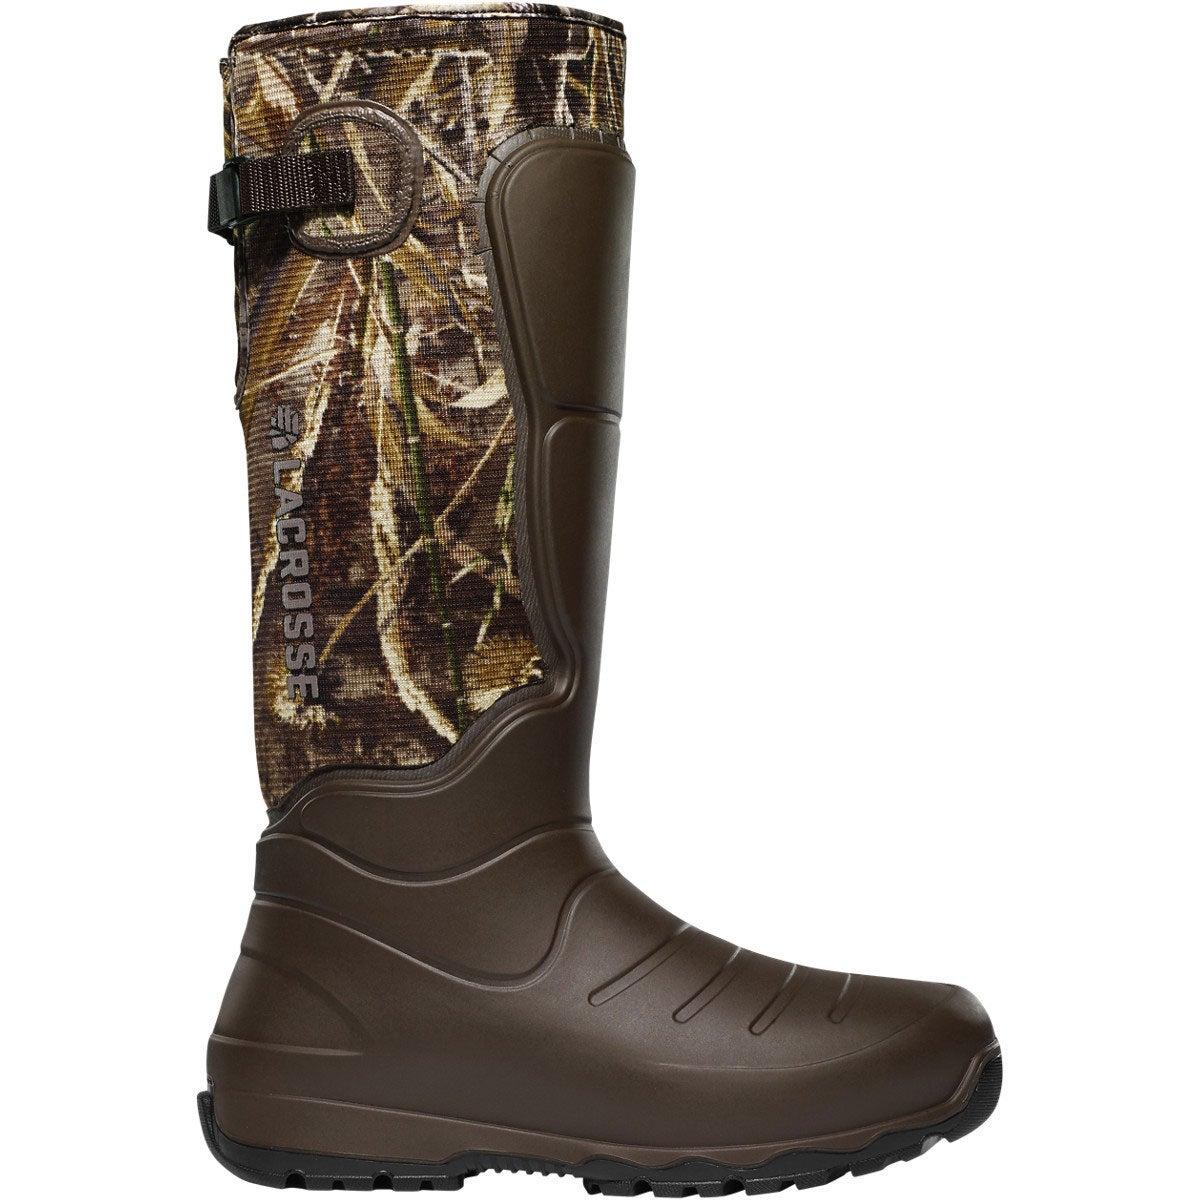 Lacrosse Aerohead Boots